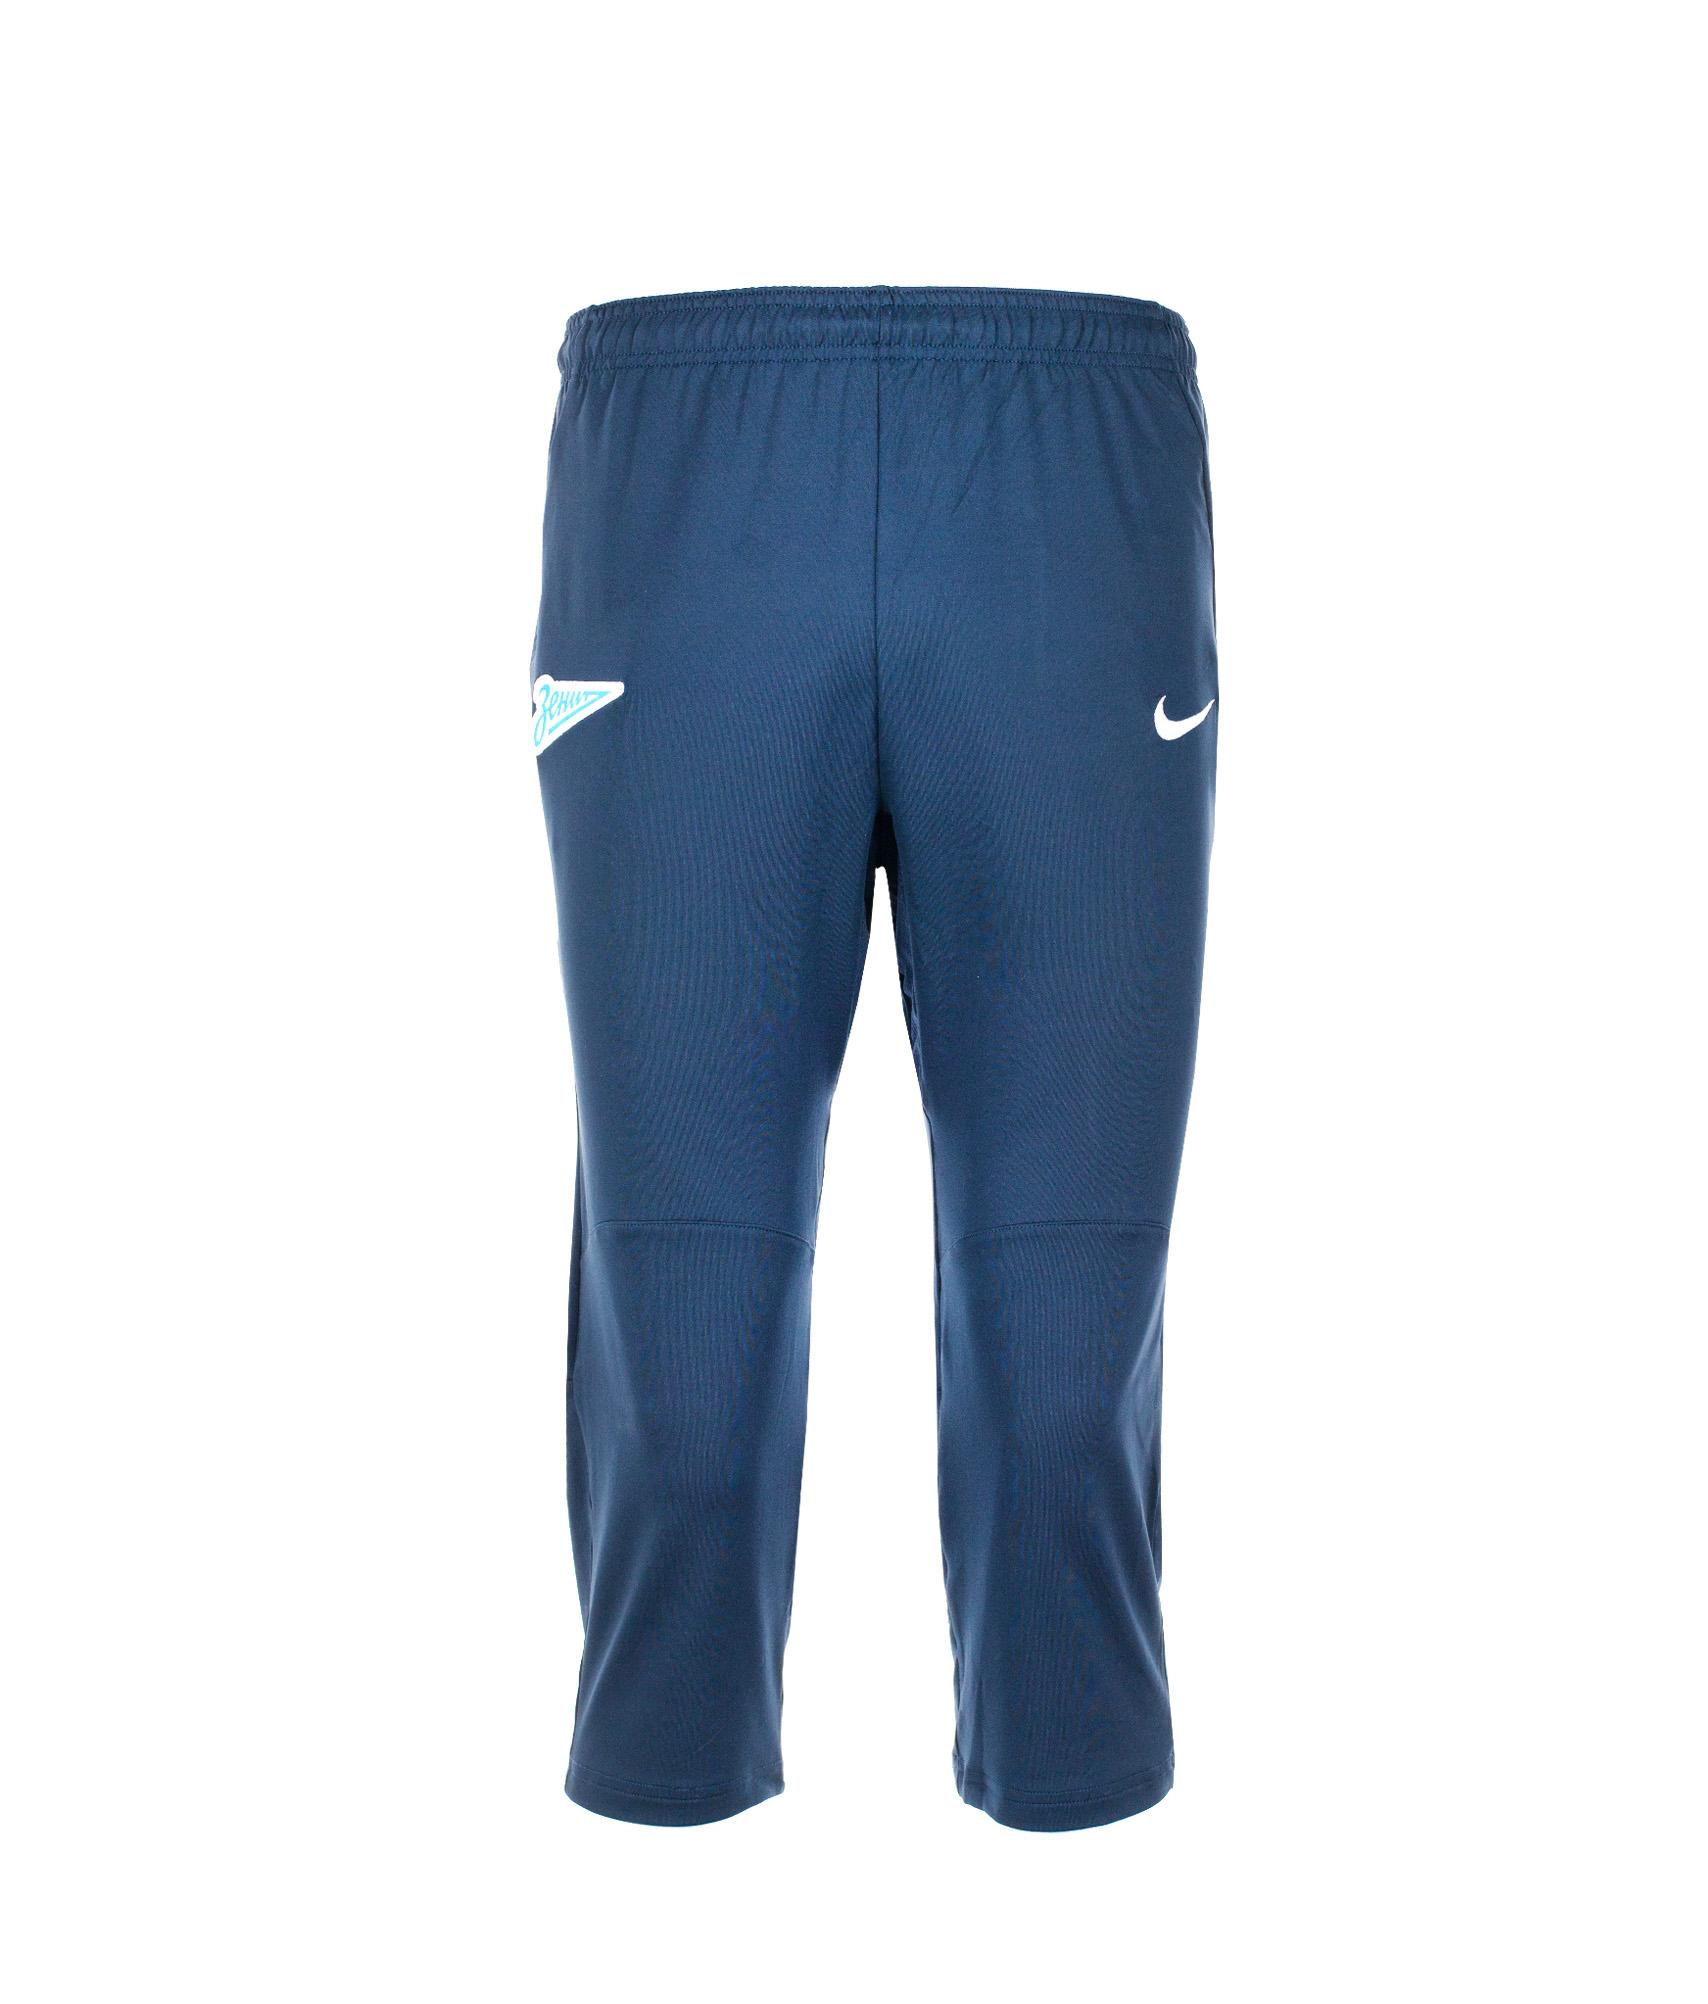 Брюки Nike Zenit Select 3/4 Tech Pant, Цвет-Синий, Размер-XXL